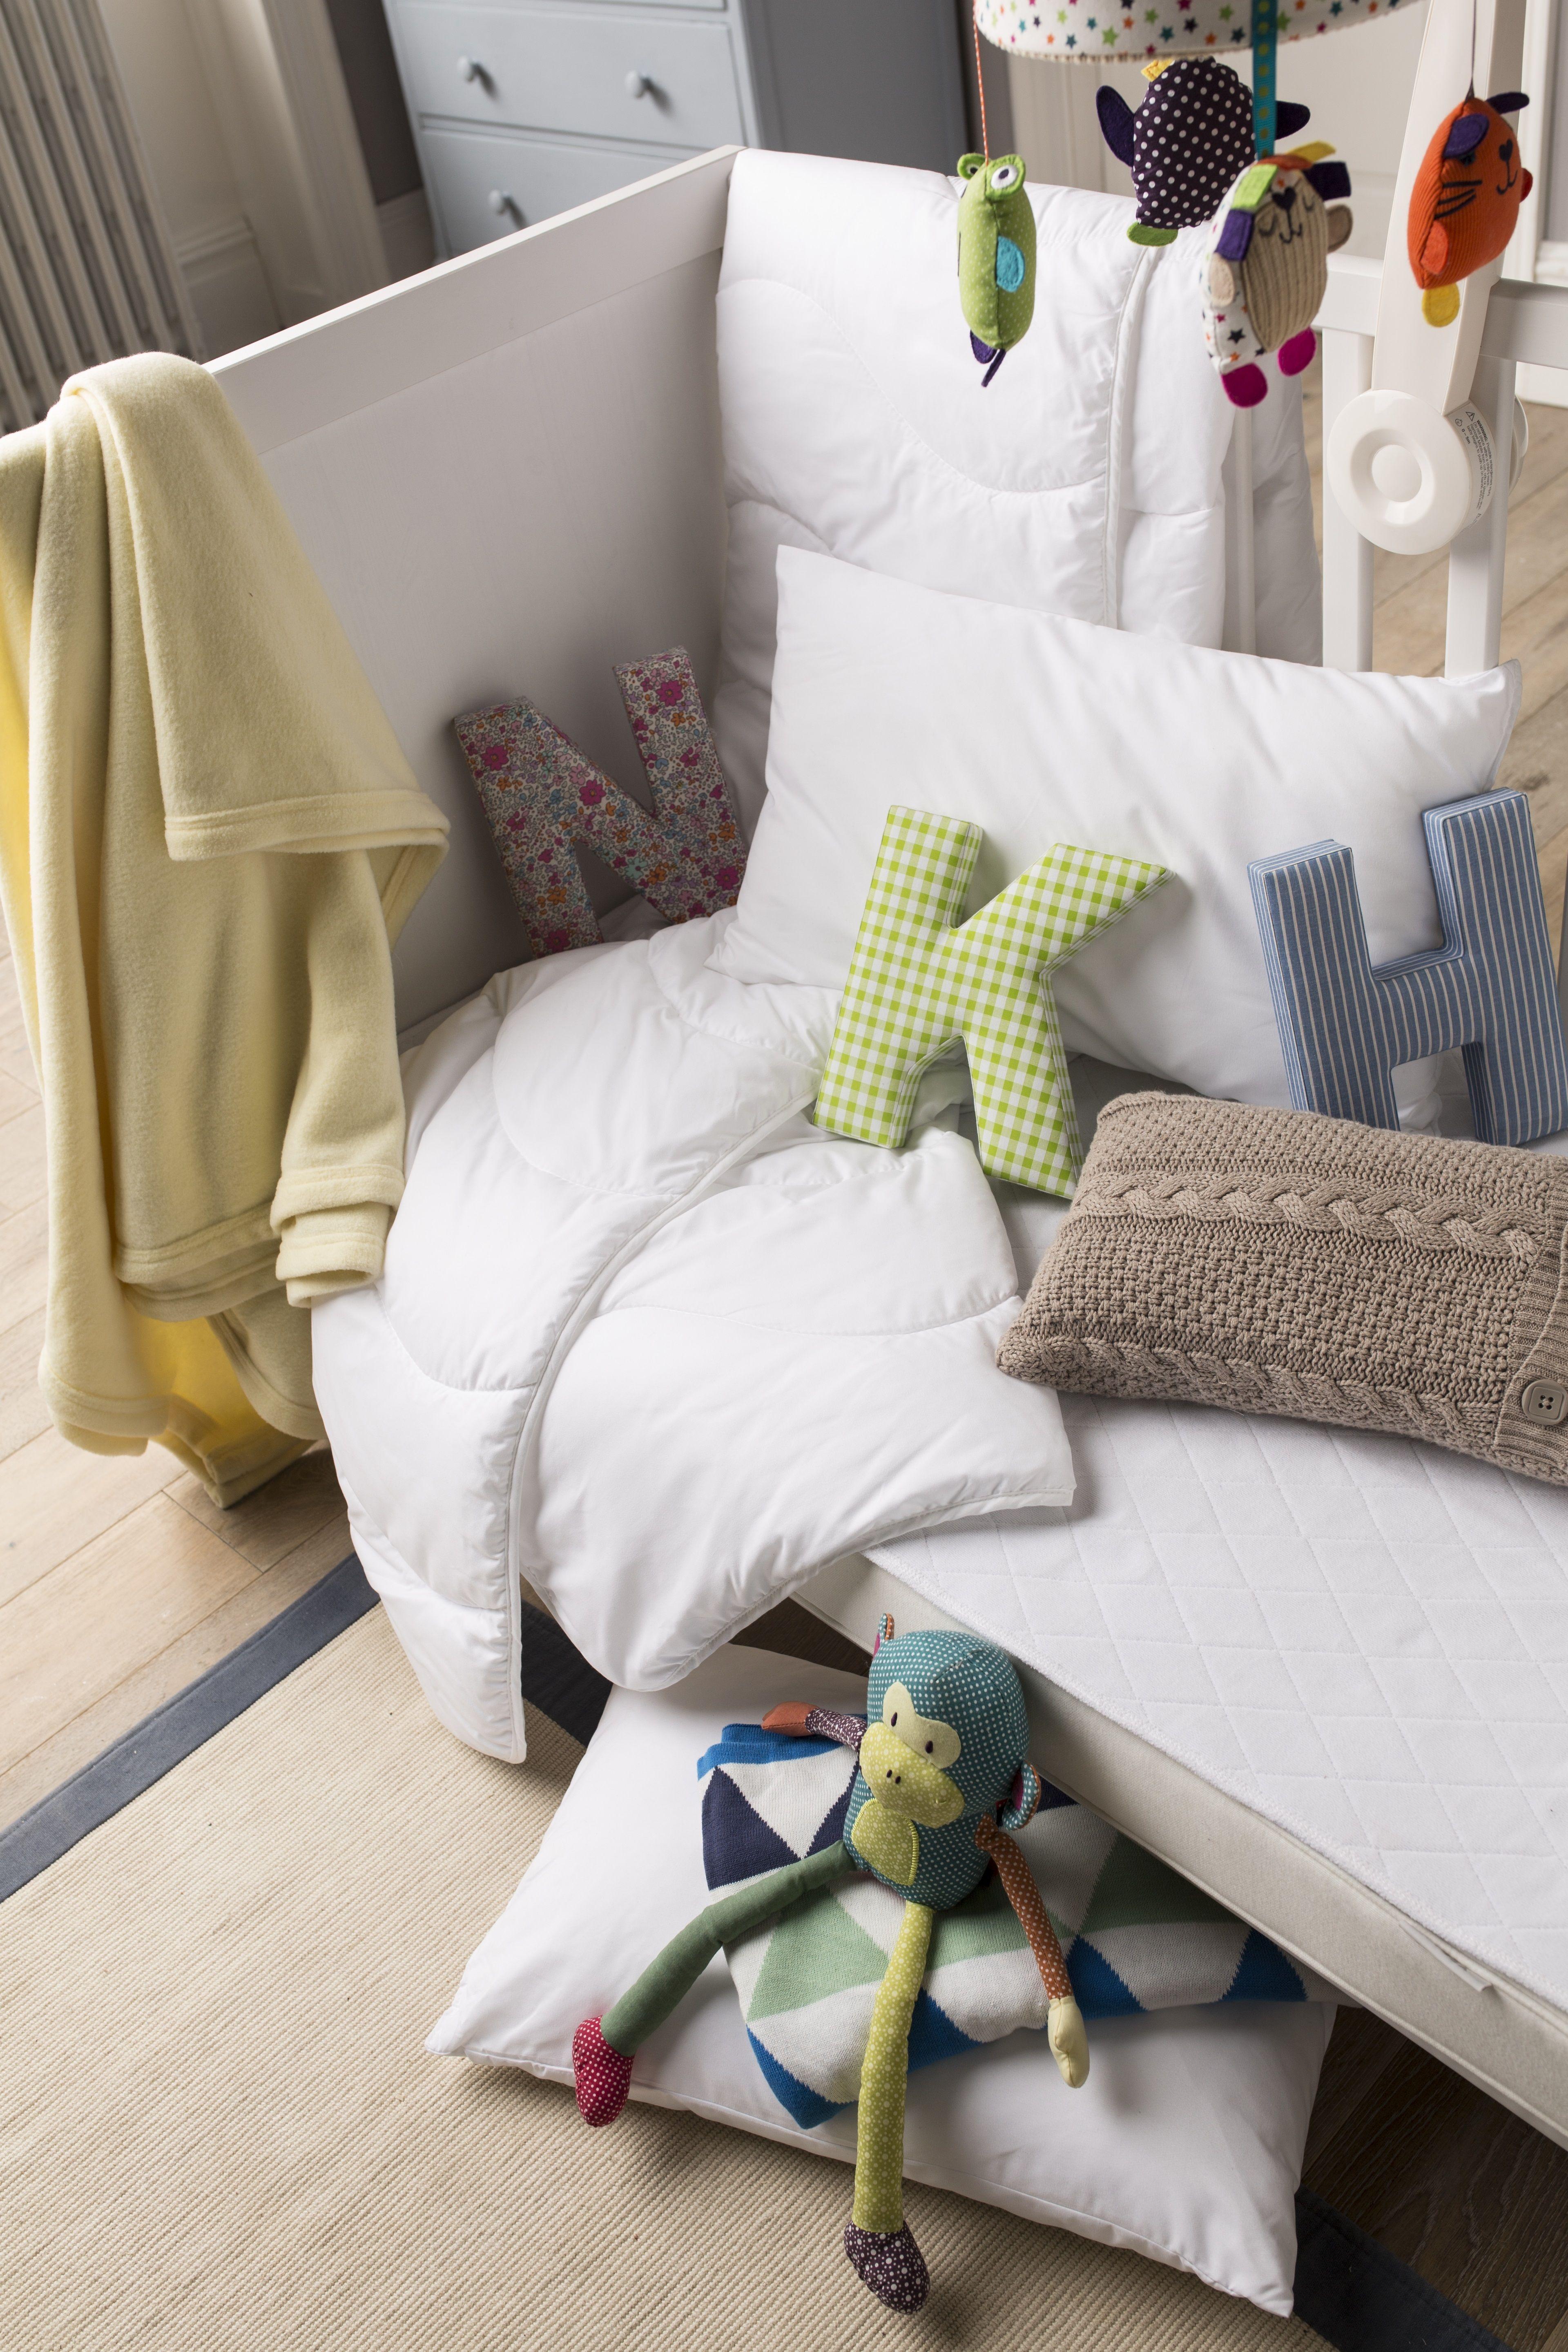 Cot The Fine Bedding Company Junior Washable Duvet 4.0 Tog